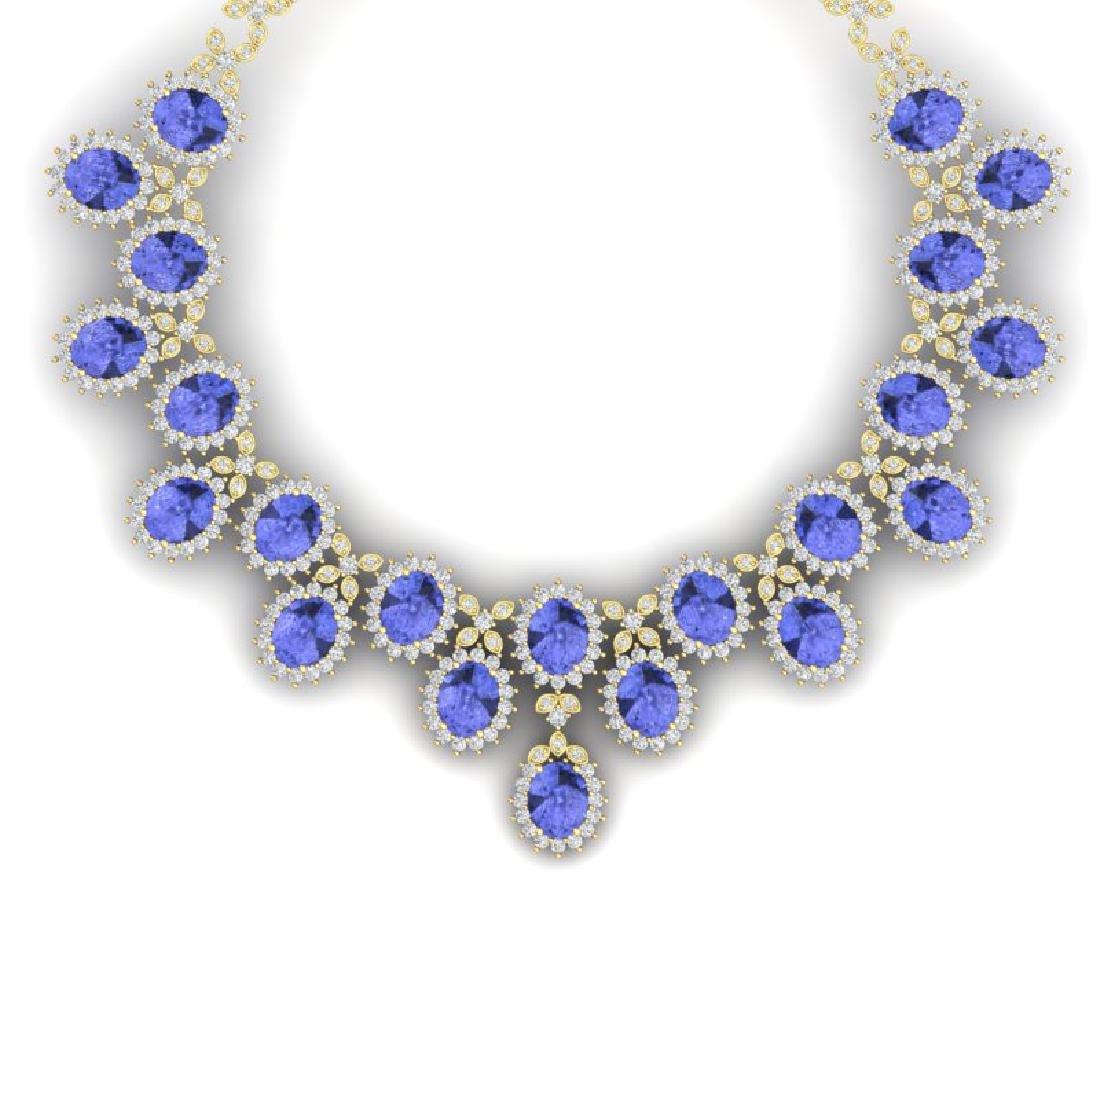 86 CTW Royalty Tanzanite & VS Diamond Necklace 18K